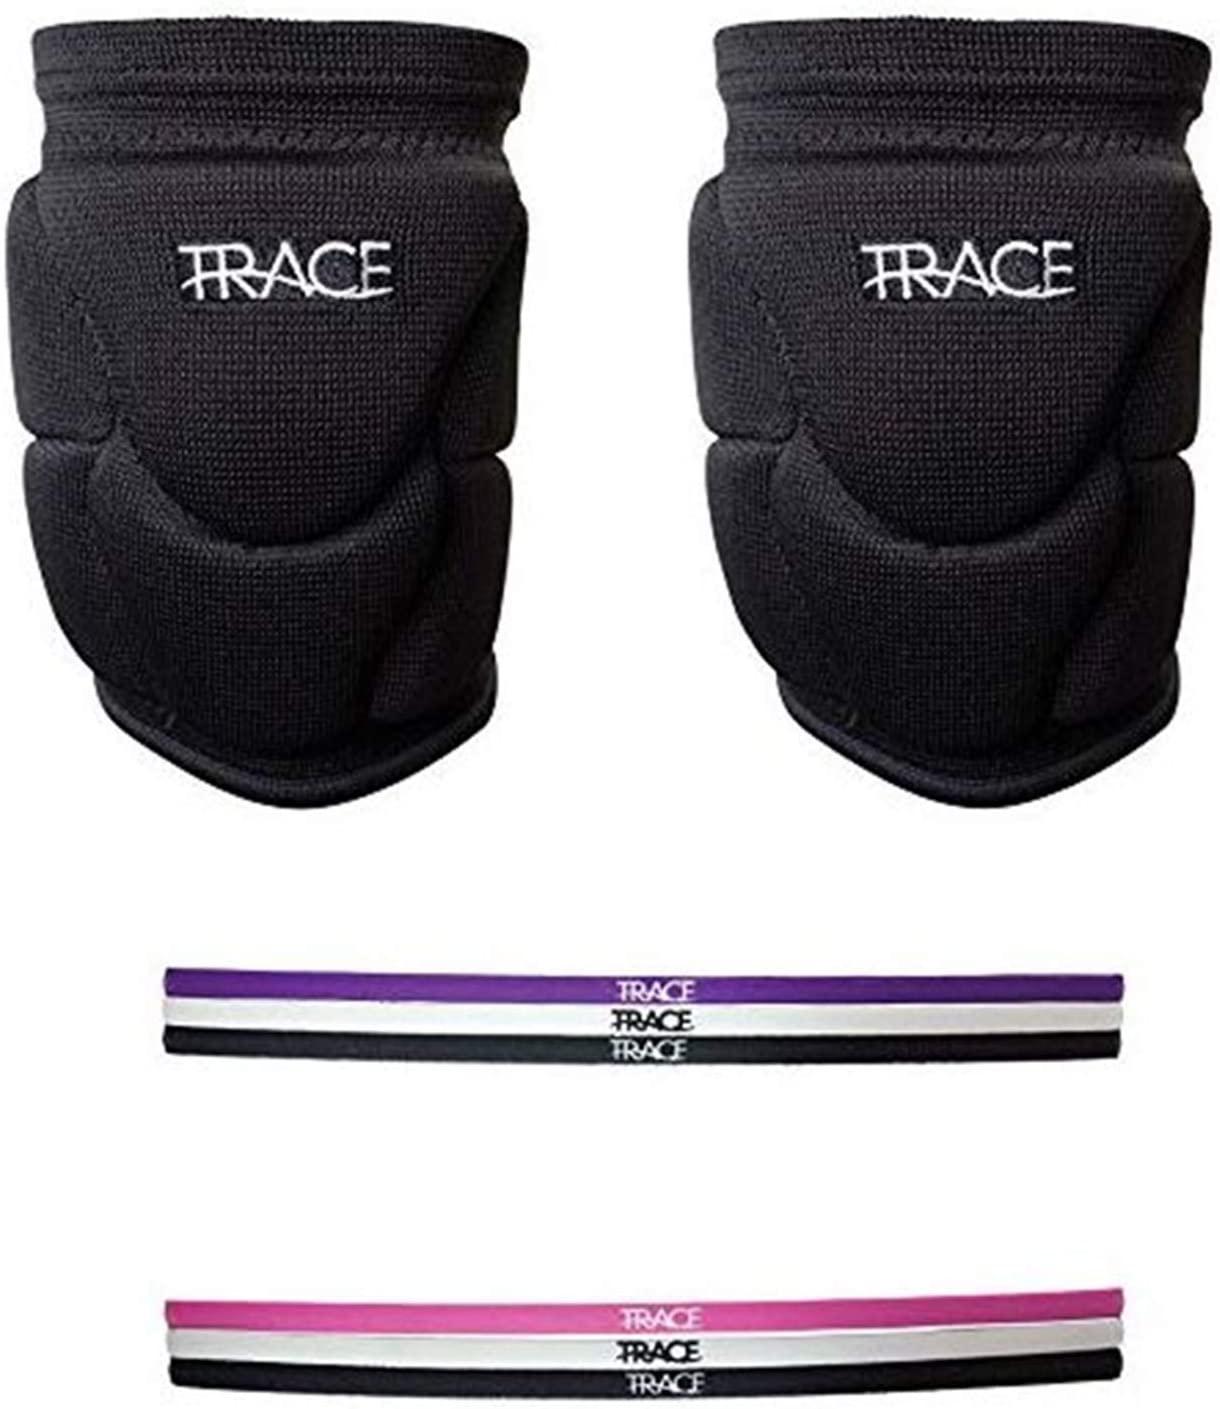 Trace Sports Volleyball Knee Pad Set W/ 3 Headbands